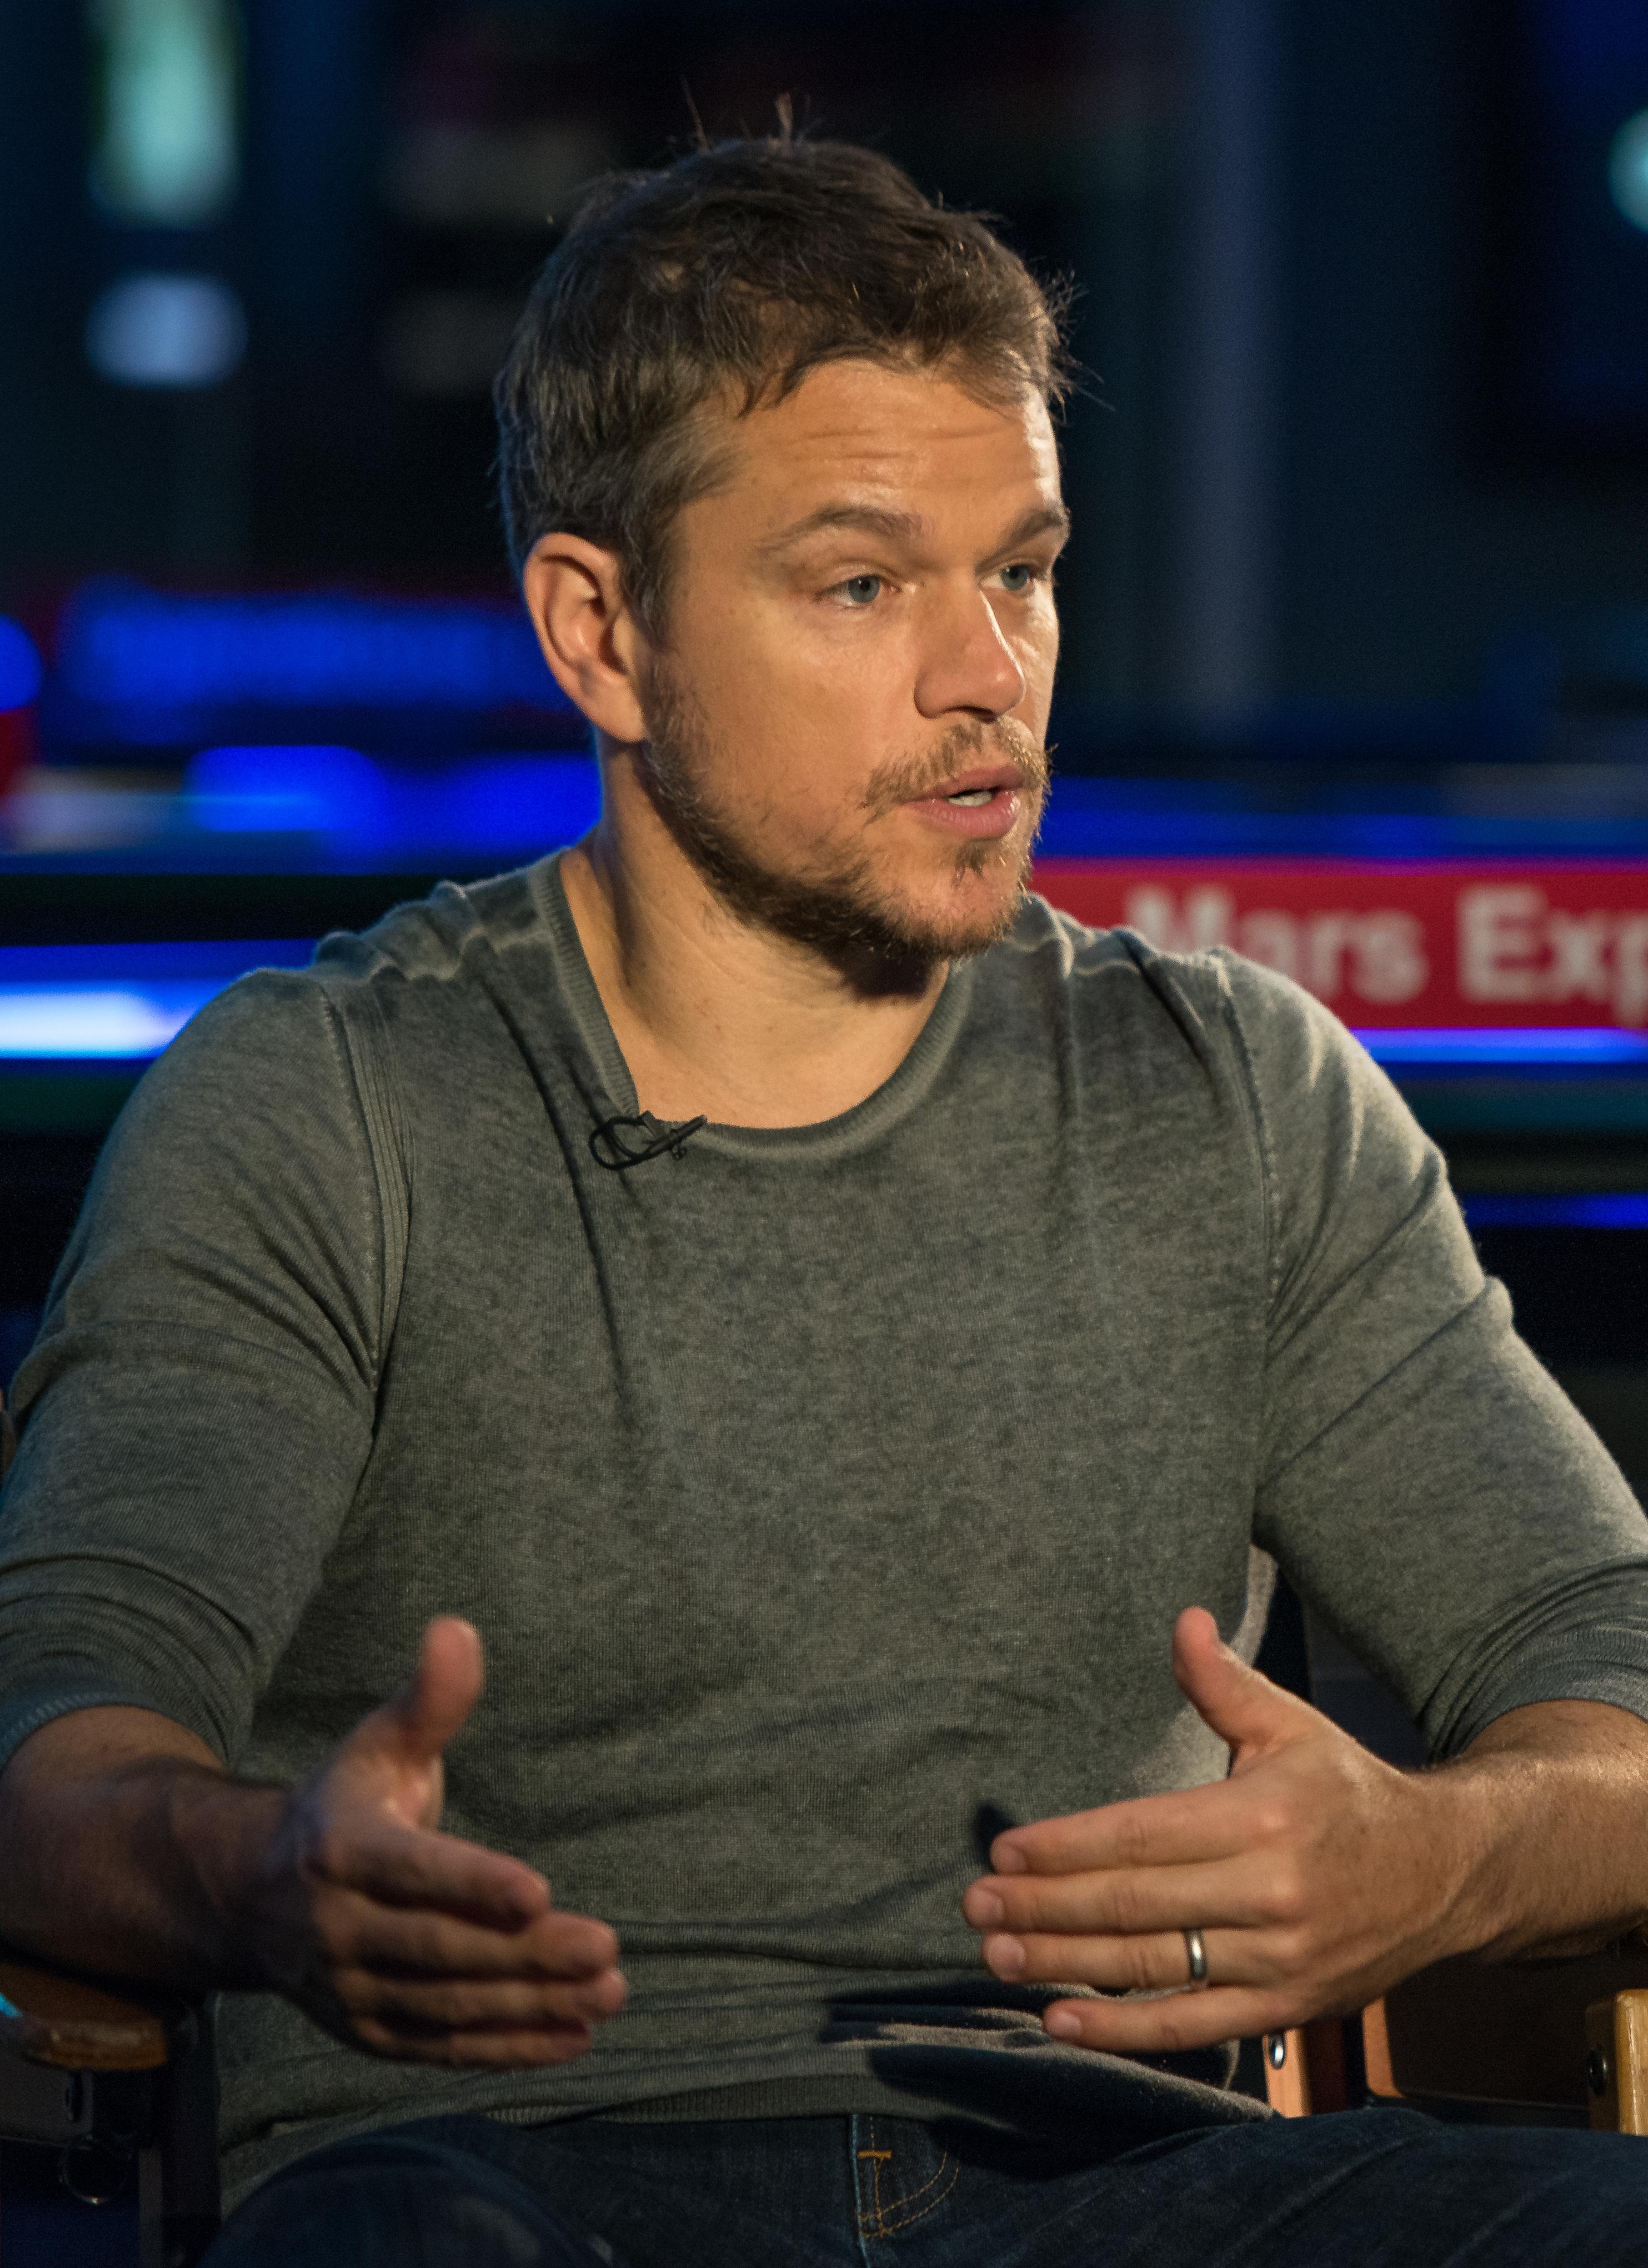 Matt Damon filmography - Wikipedia